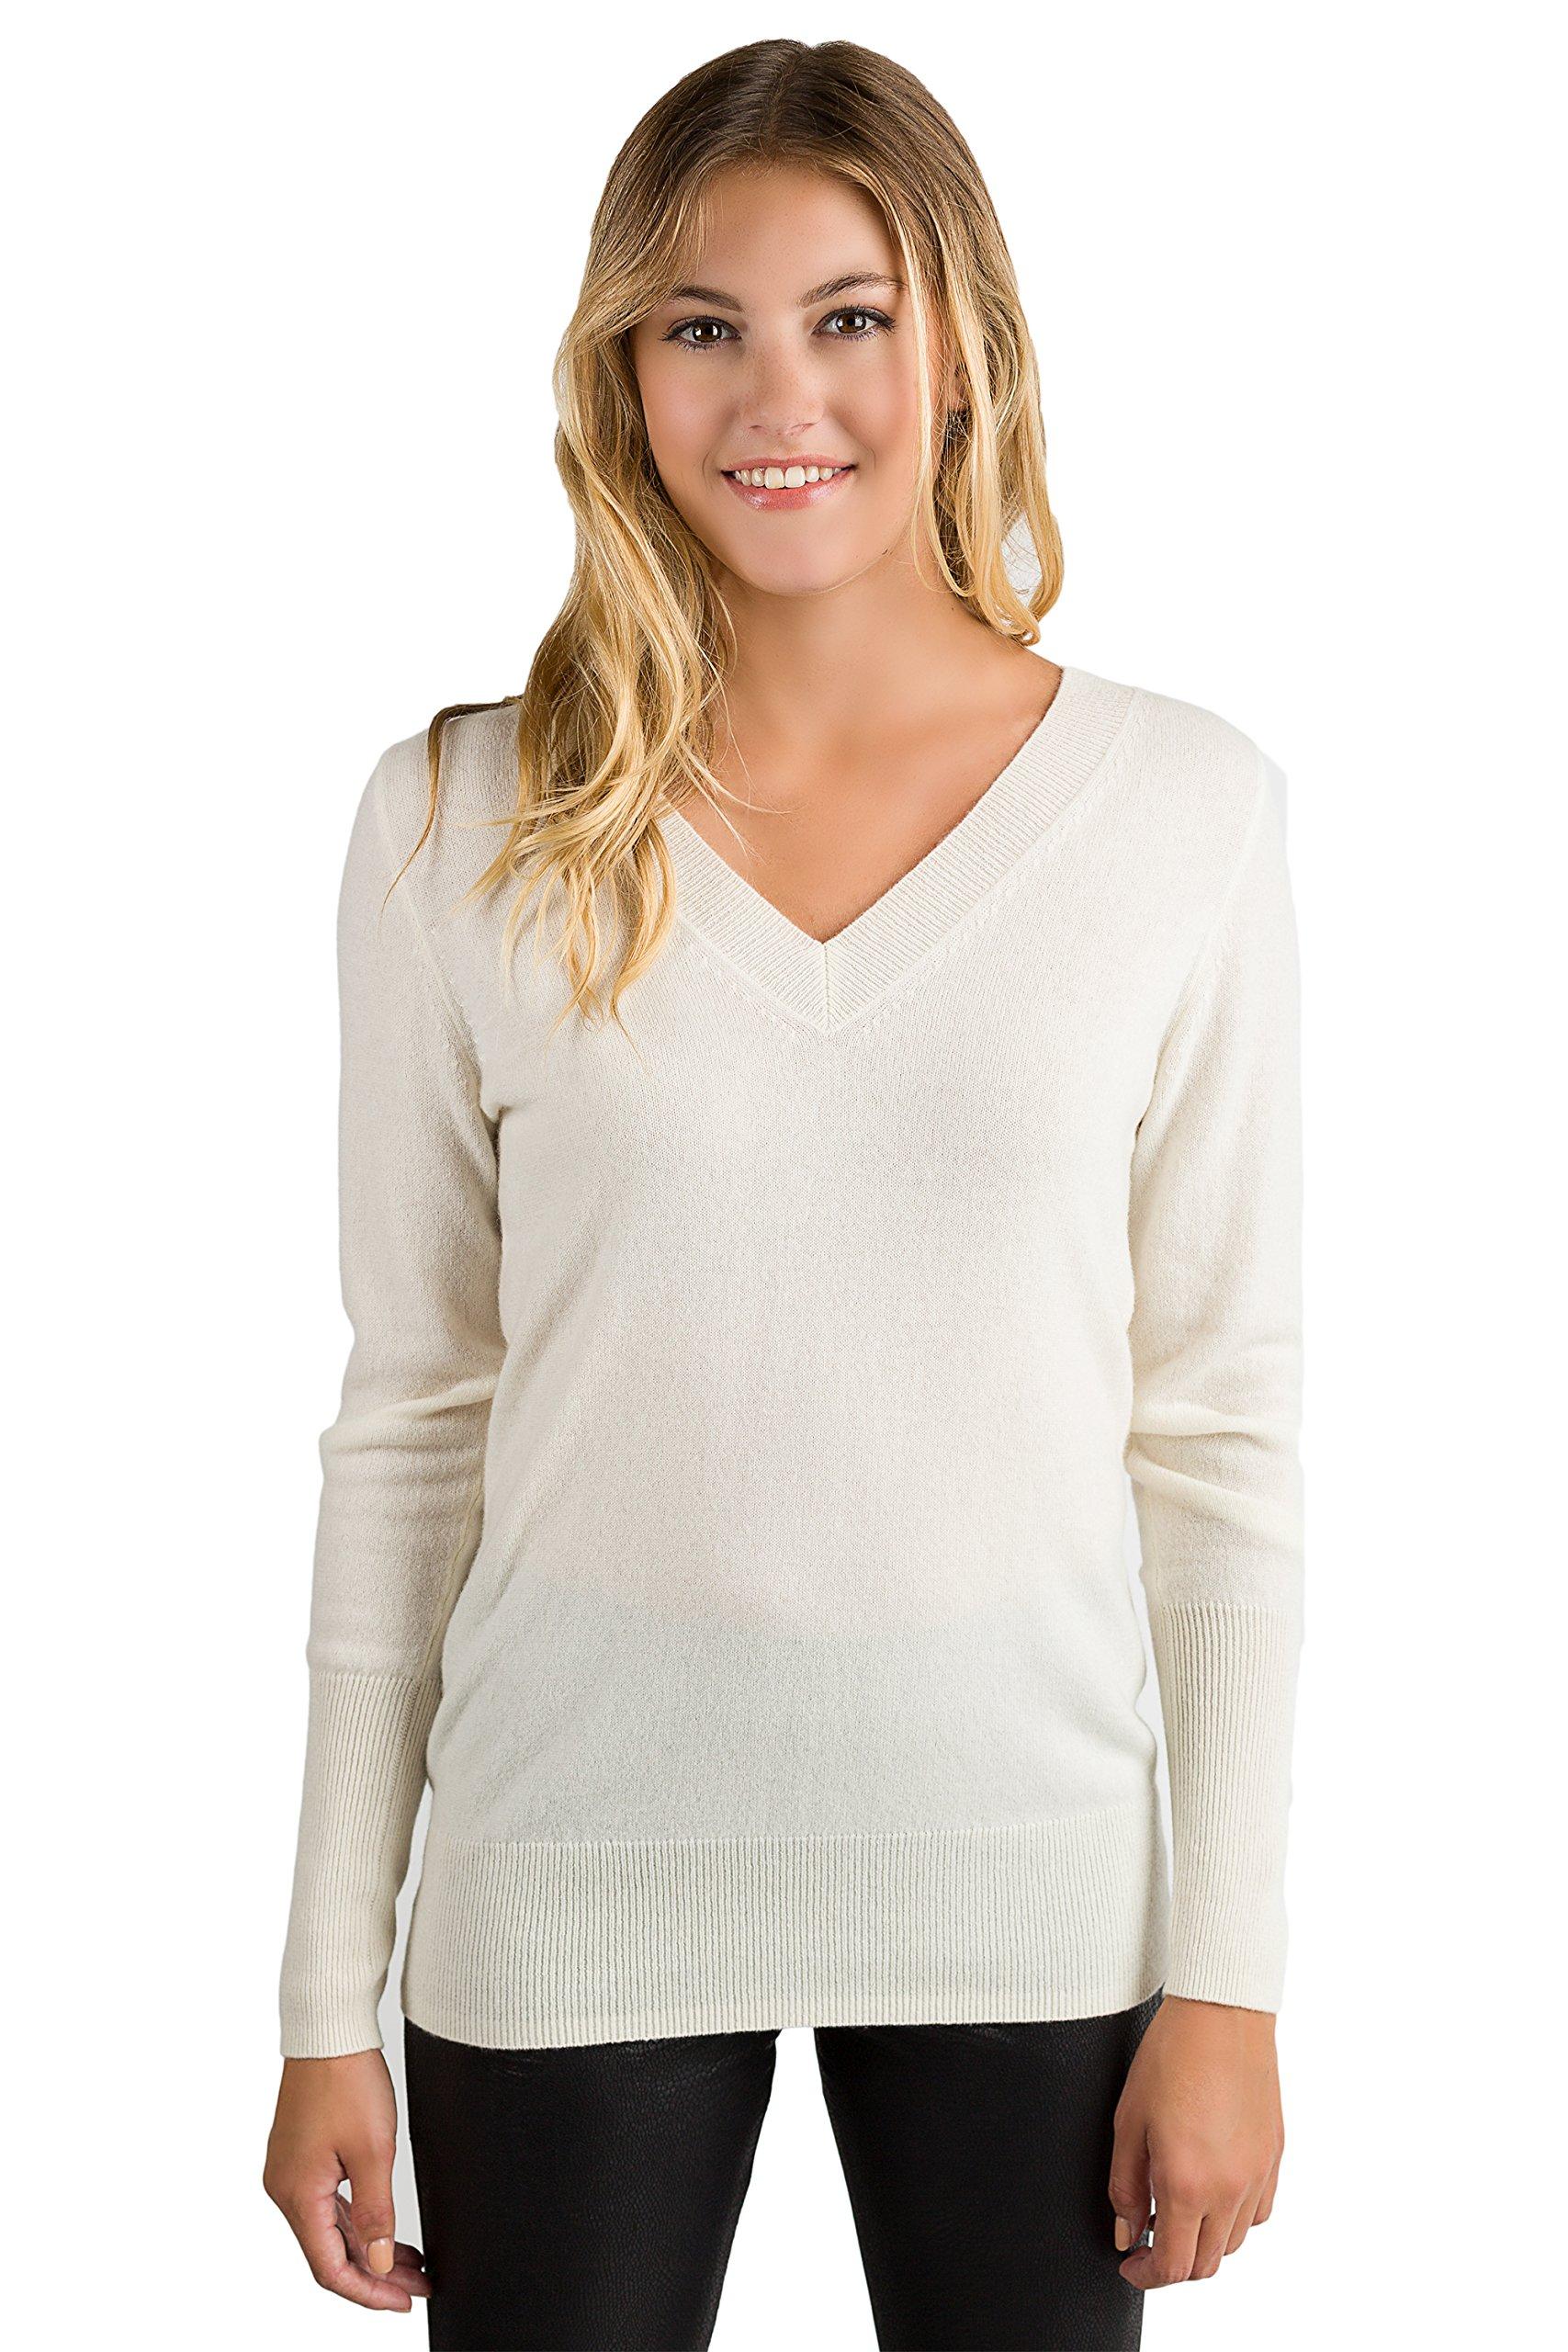 JENNIE LIU Women's 100% Pure Cashmere Long Sleeve Ava V Neck Pullover Sweater (PM, Cream)